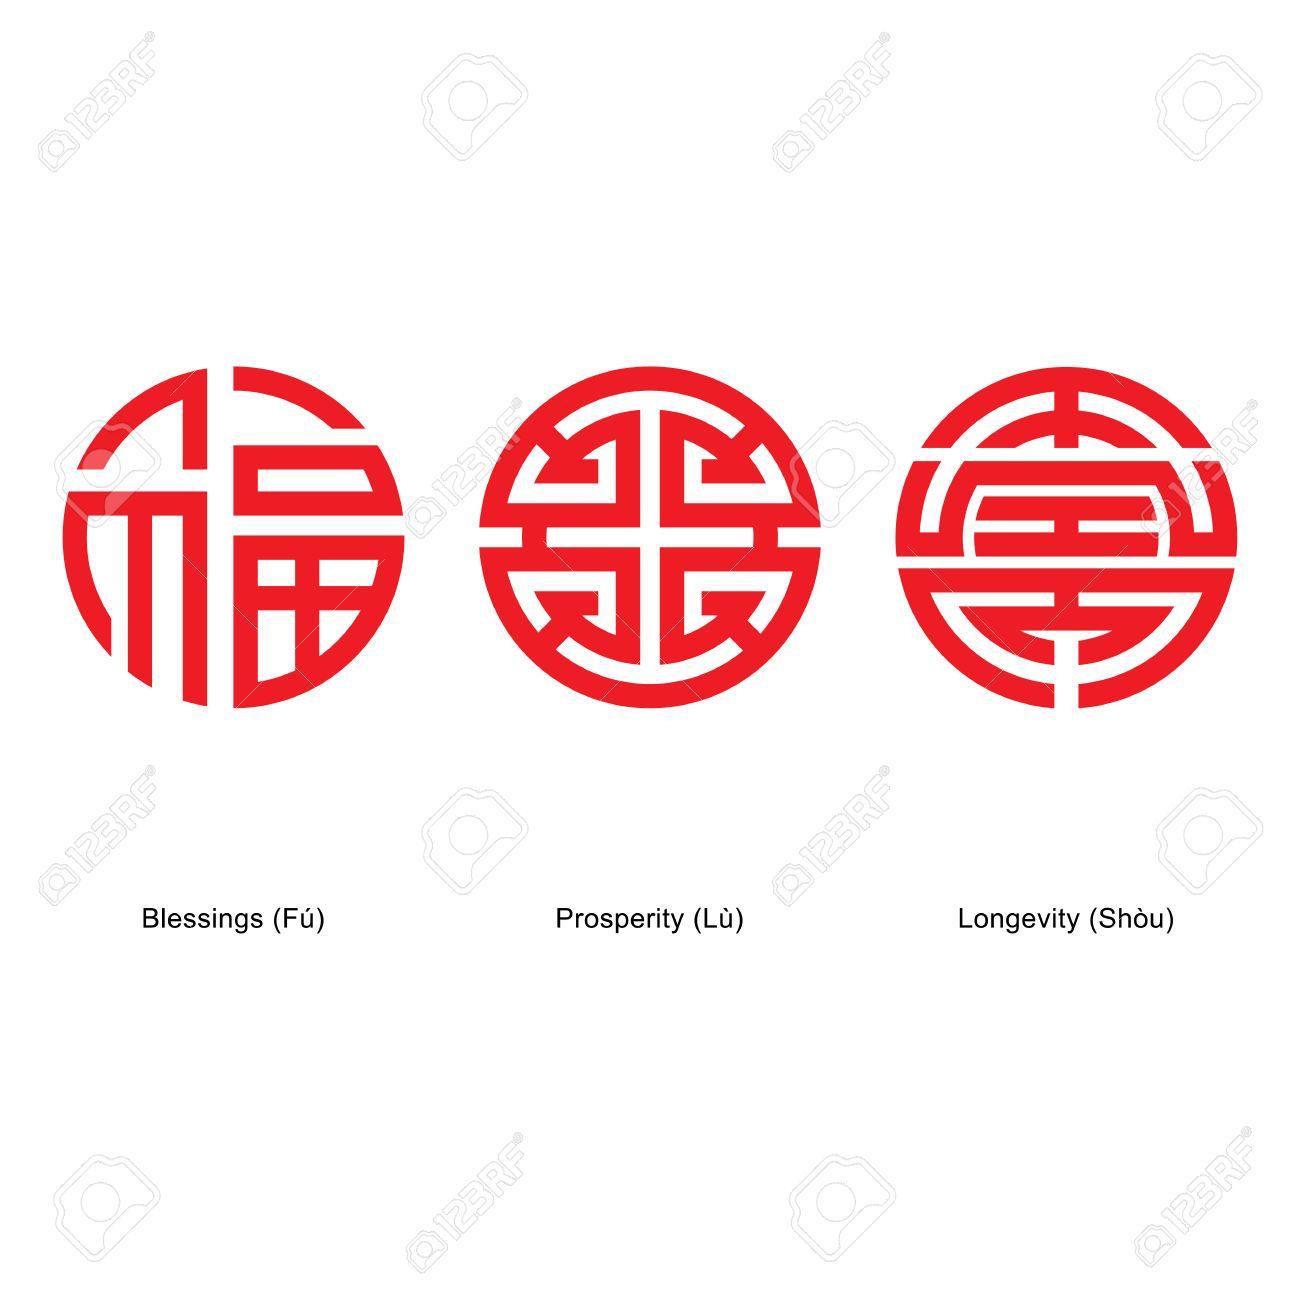 45911632 chinese lucky symbols fu lu shou stock vector chinese new 45911632 chinese lucky symbols fu lu shou stock buycottarizona